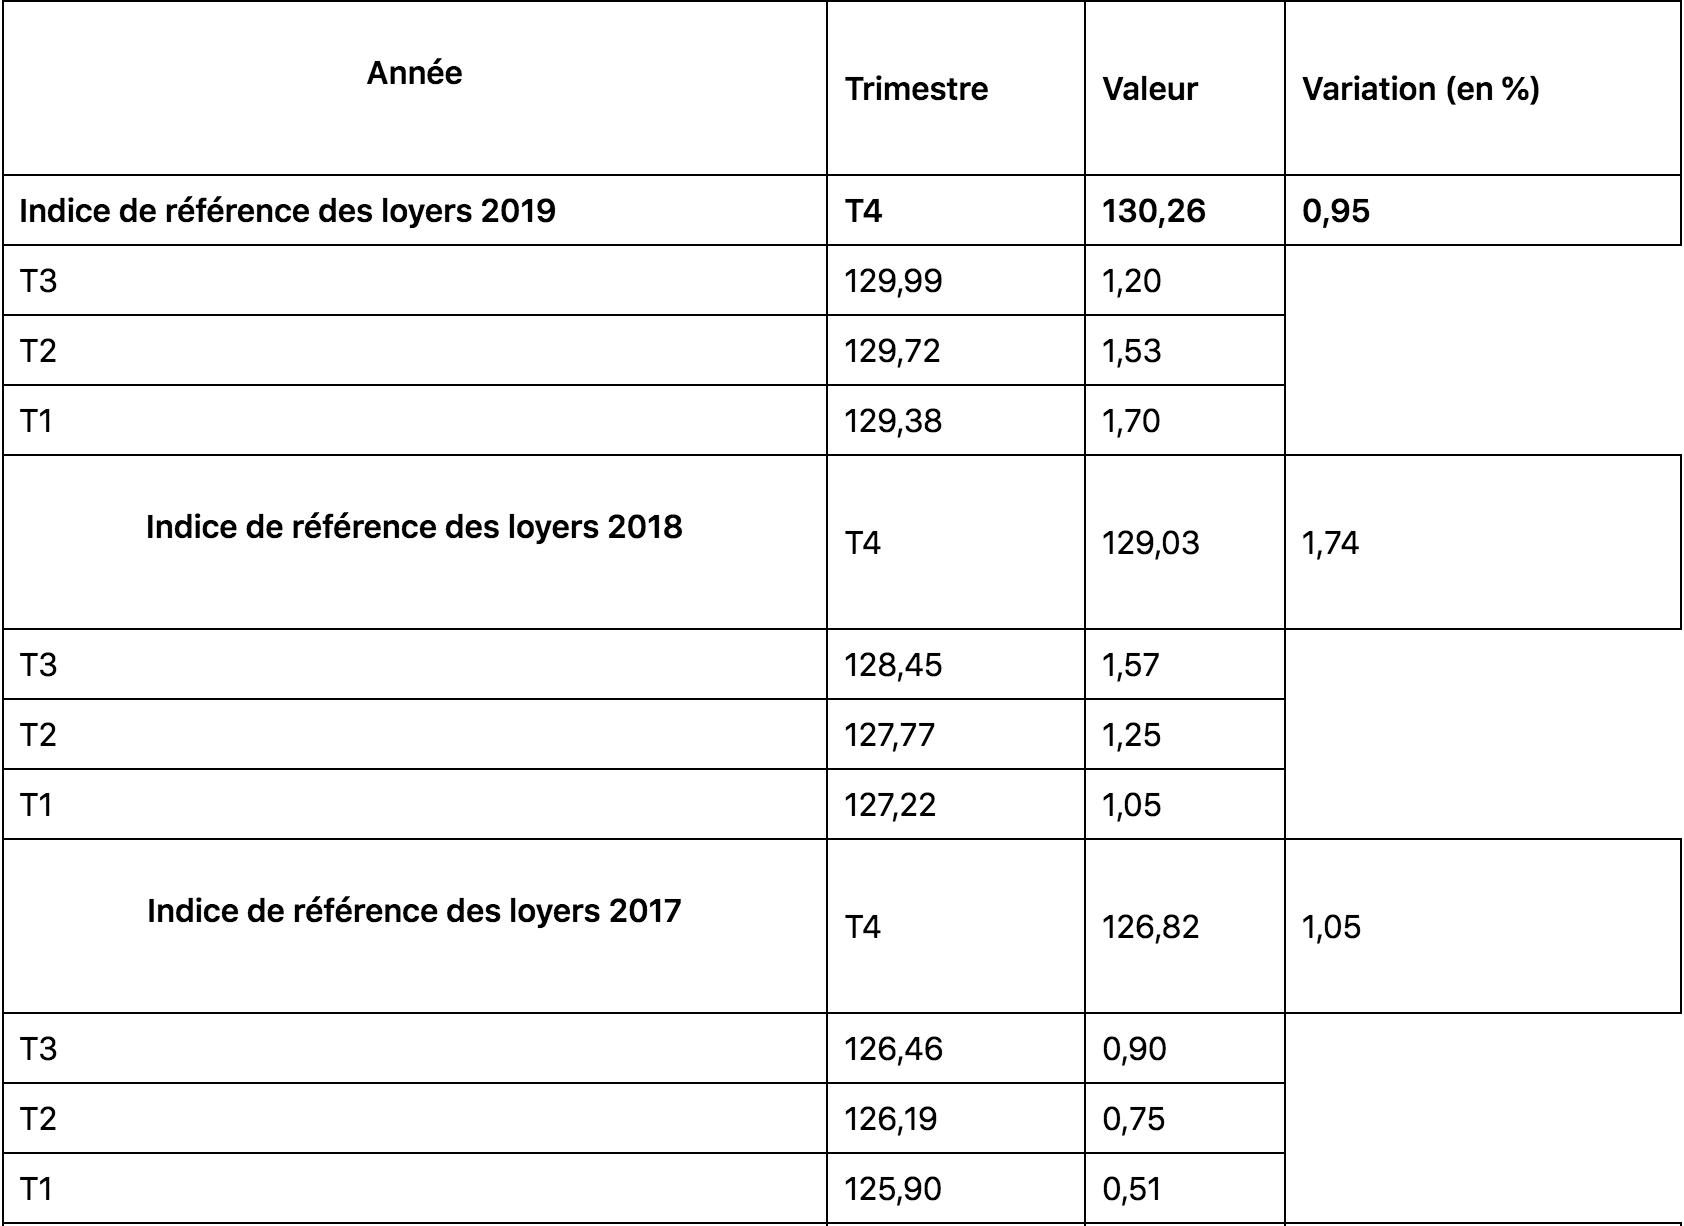 Tableau indice de référence 2019,2018,2017